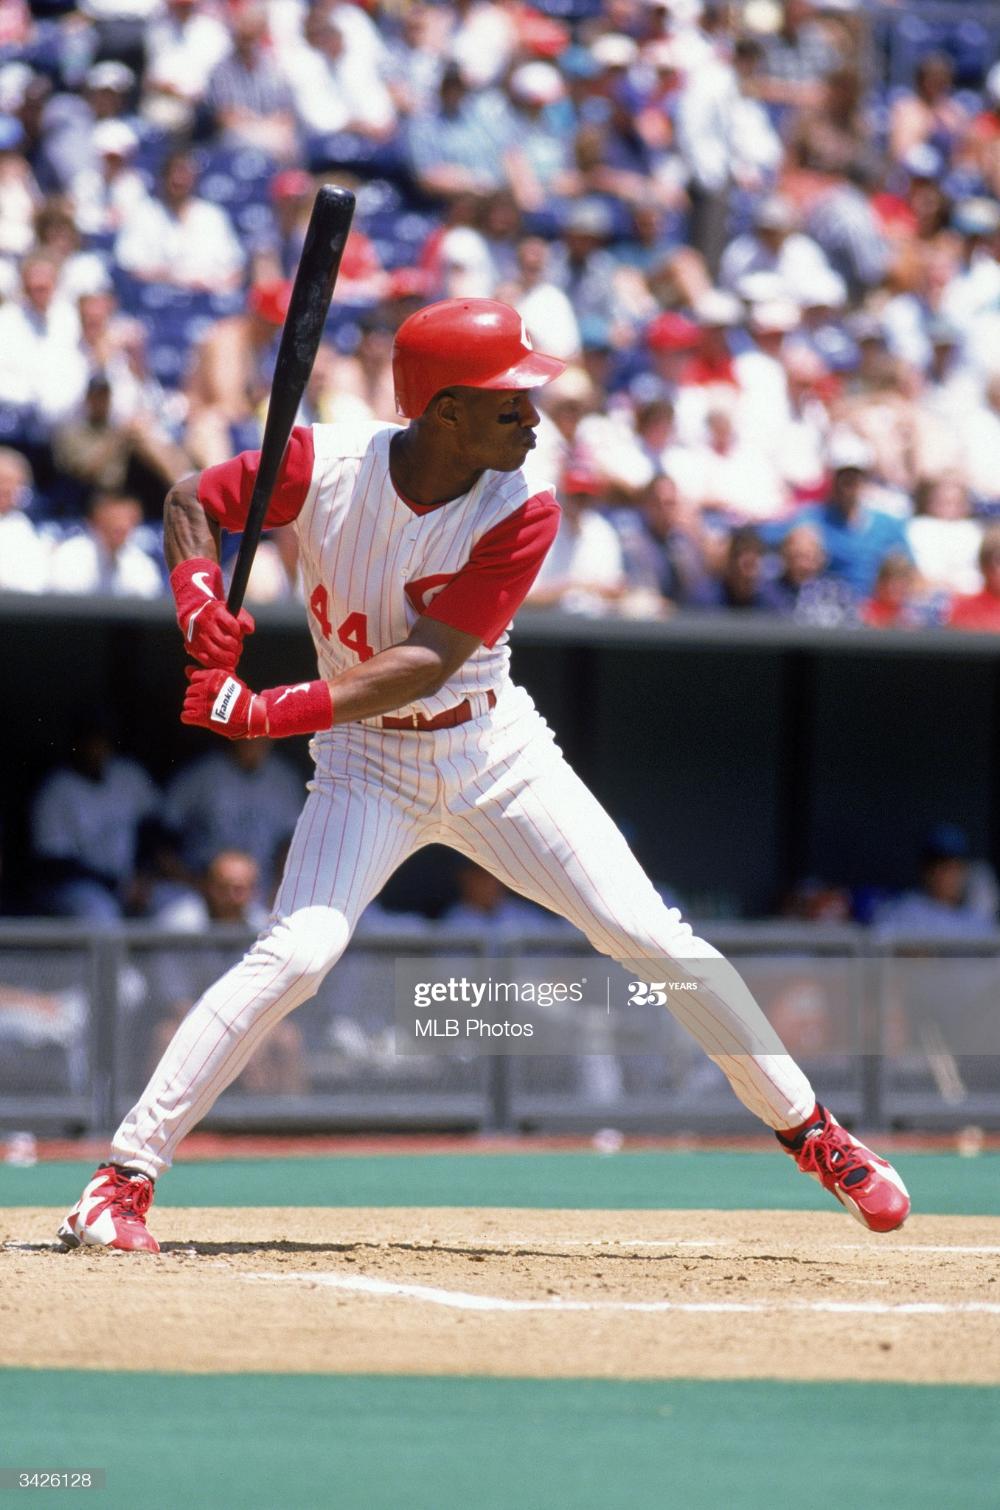 Outfielder Eric Davis Of The Cincinnati Reds At Bat During A Game In 2020 Cincinnati Reds Eric Davis Cincinnati Reds Baseball